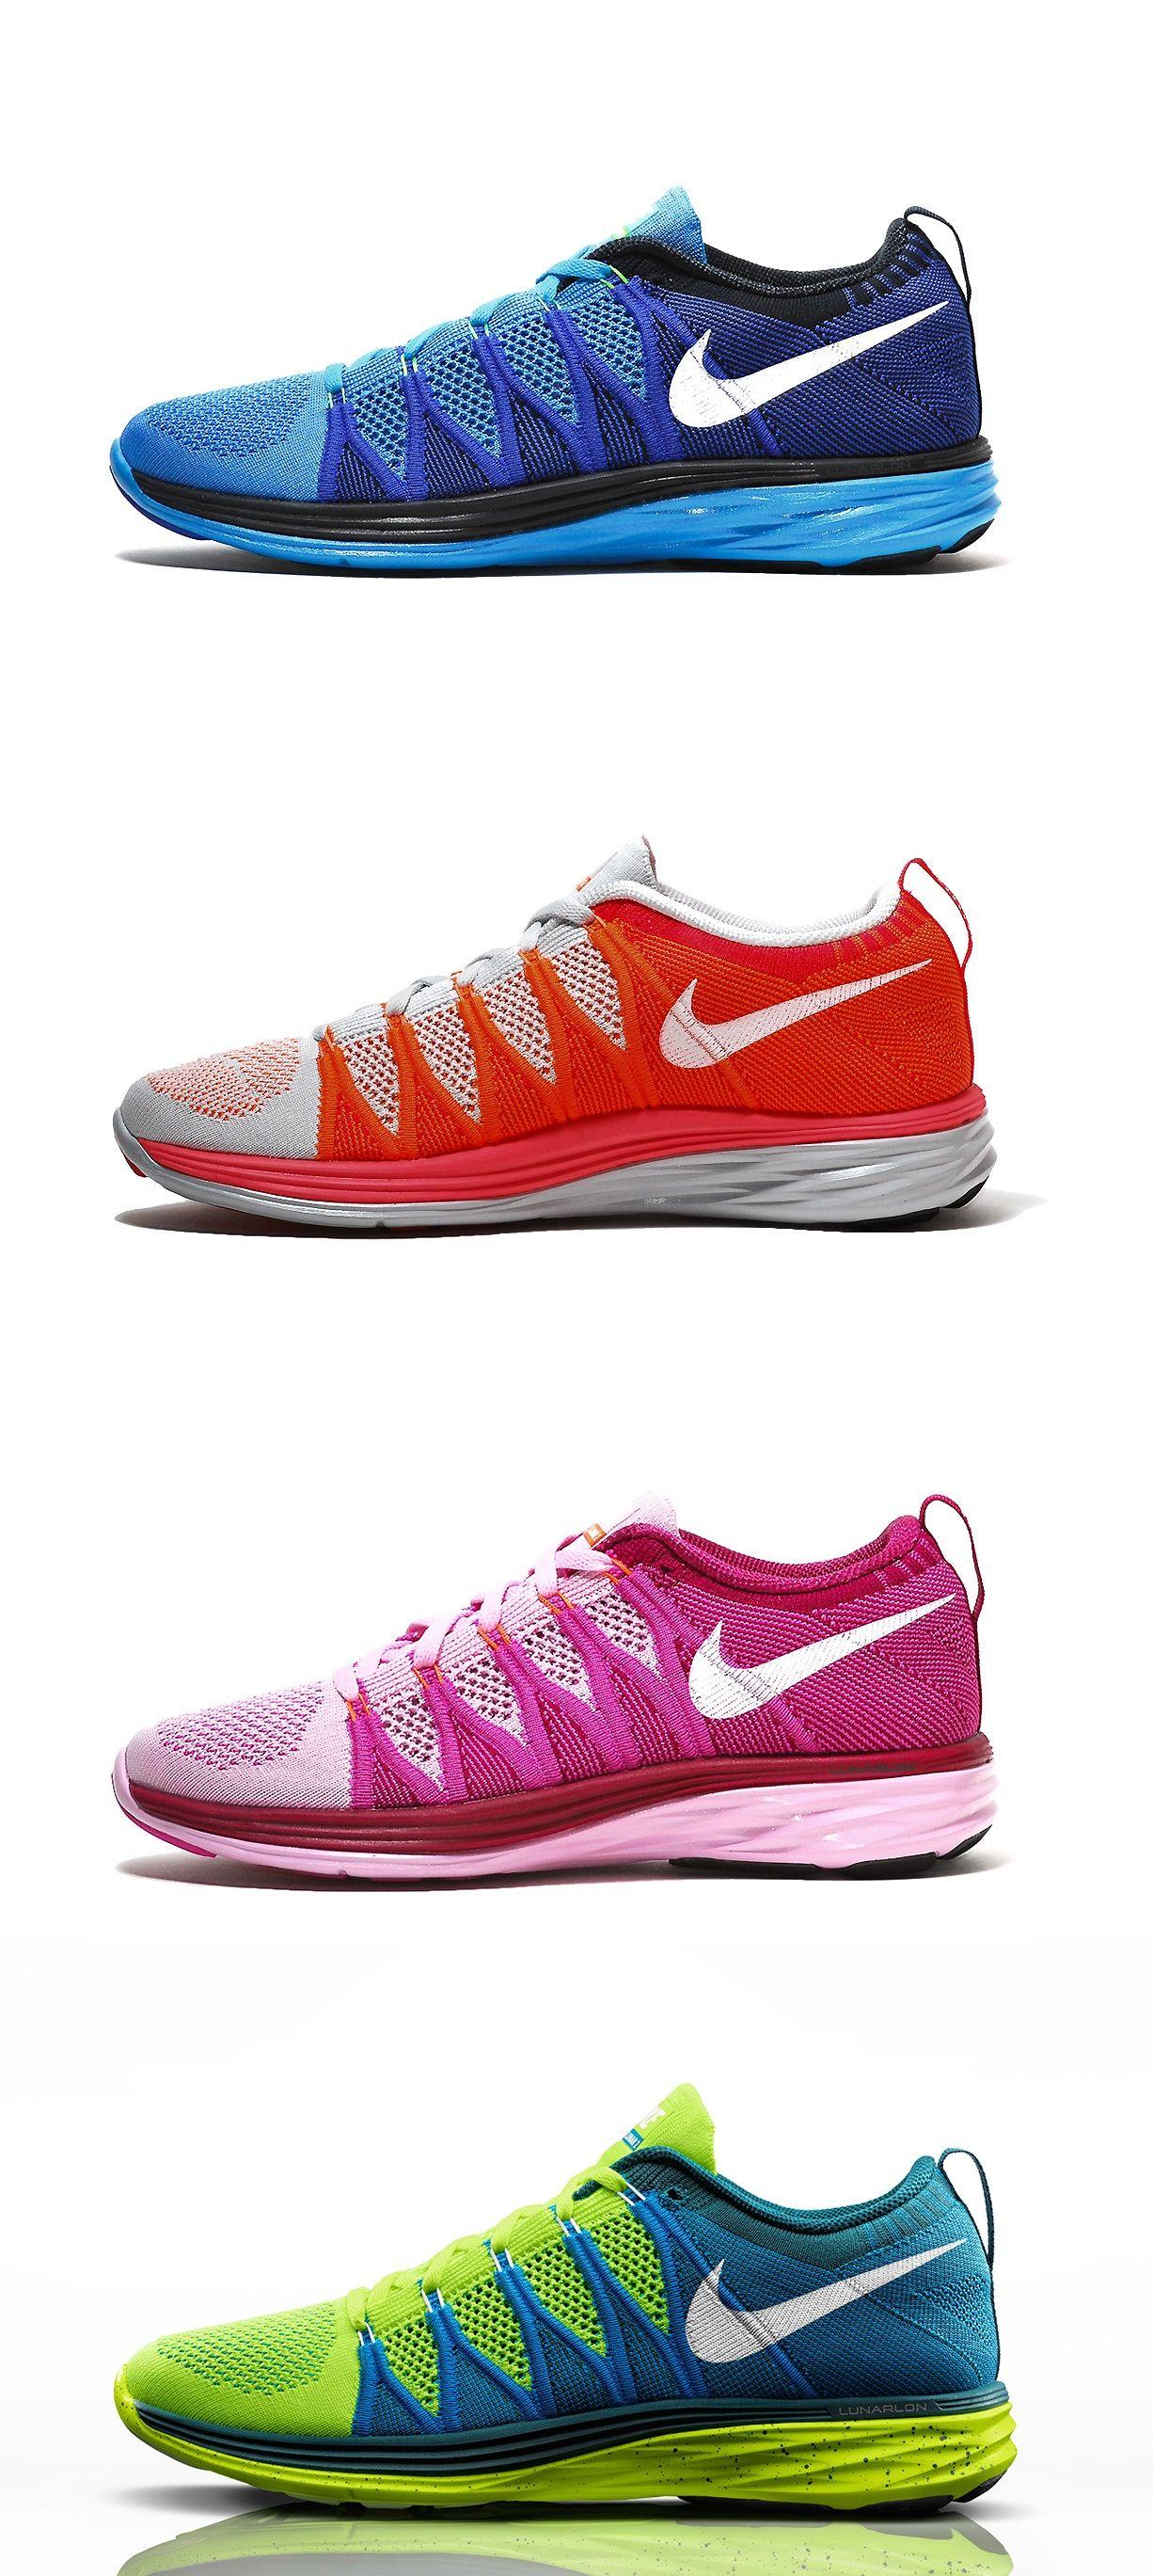 perdonado Lírico boicotear  Impossibly Light, Incredibly Strong: Nike Flyknit Lunar2 | Nike, Adidas  shoes outlet, Nike flyknit